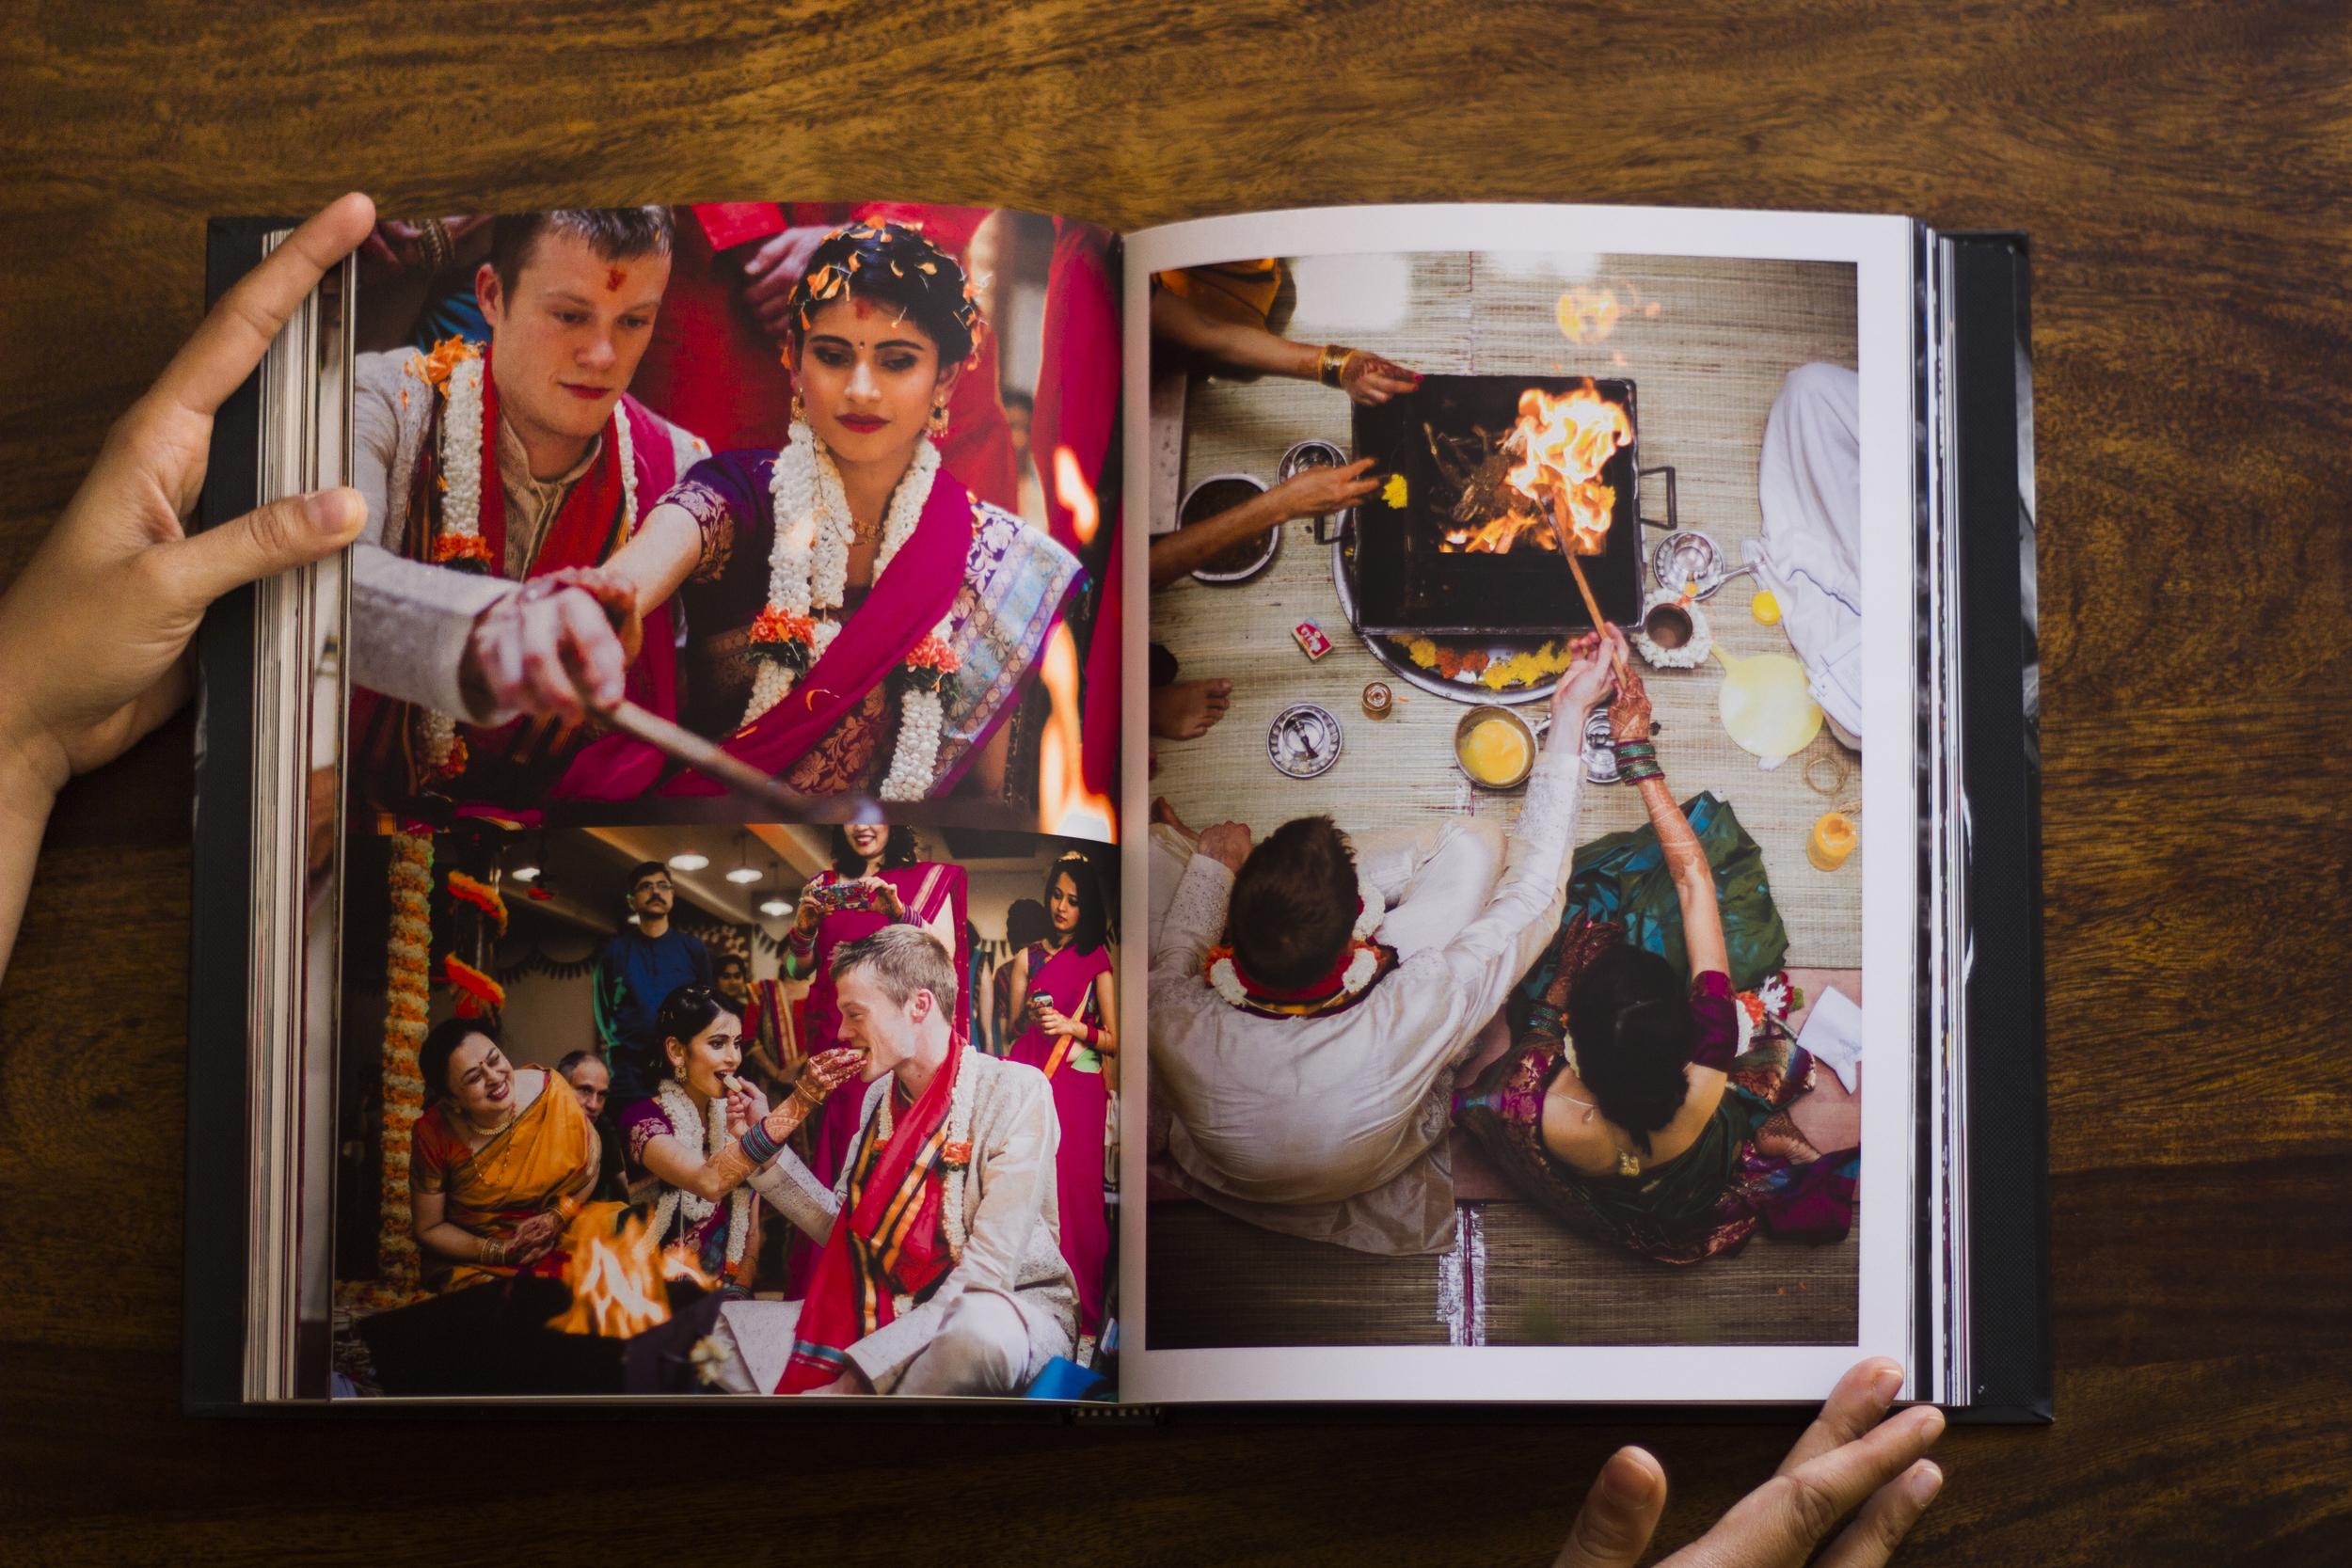 jude_lazaro_weddings_bangalore_india_Photo Book_NRI_Hindu_Muslim_Christian_Candid__5.jpg